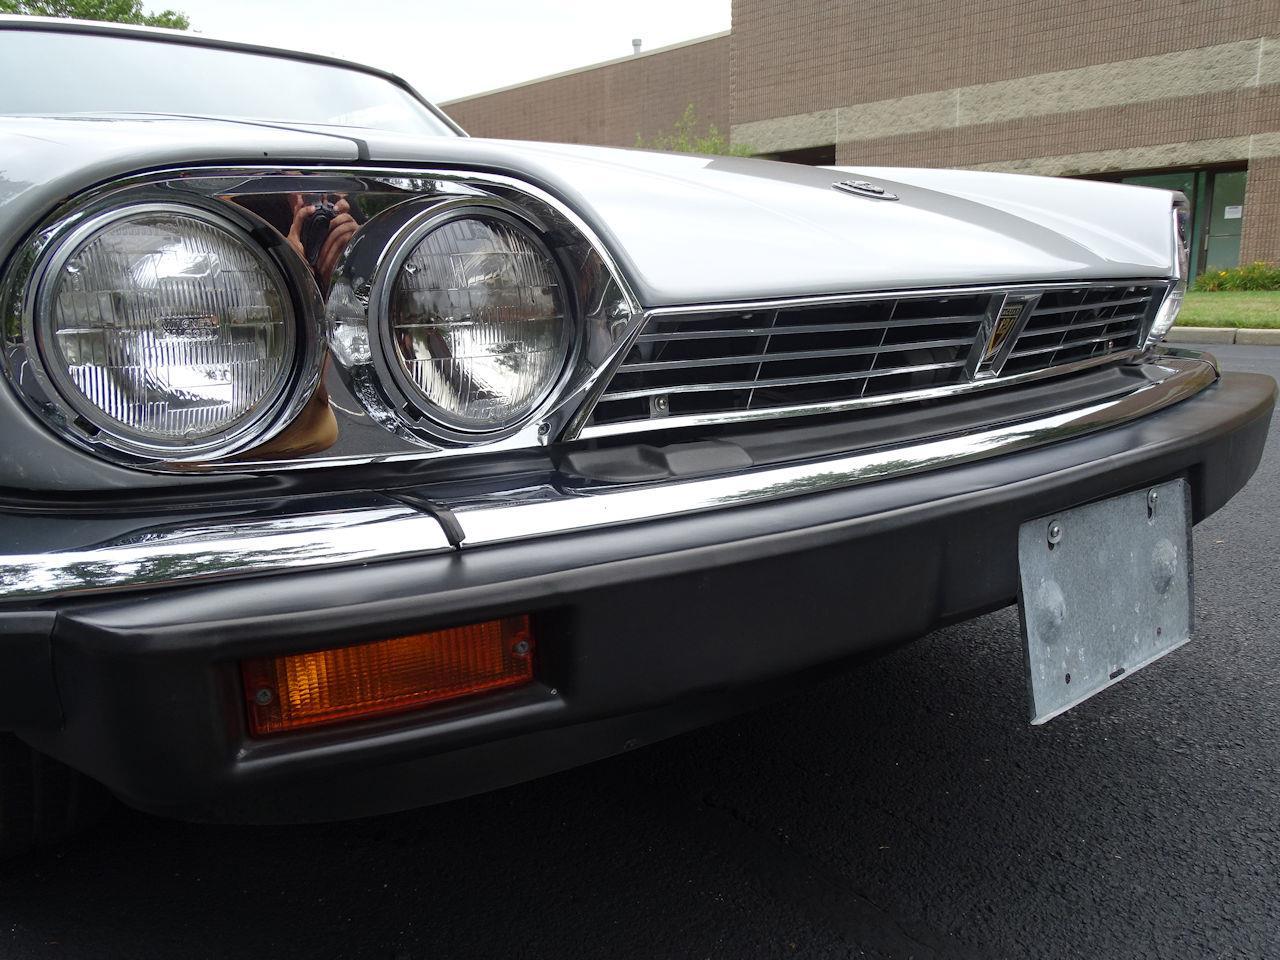 Large Picture of '82 Jaguar XJ - $10,995.00 Offered by Gateway Classic Cars - Philadelphia - LI4S